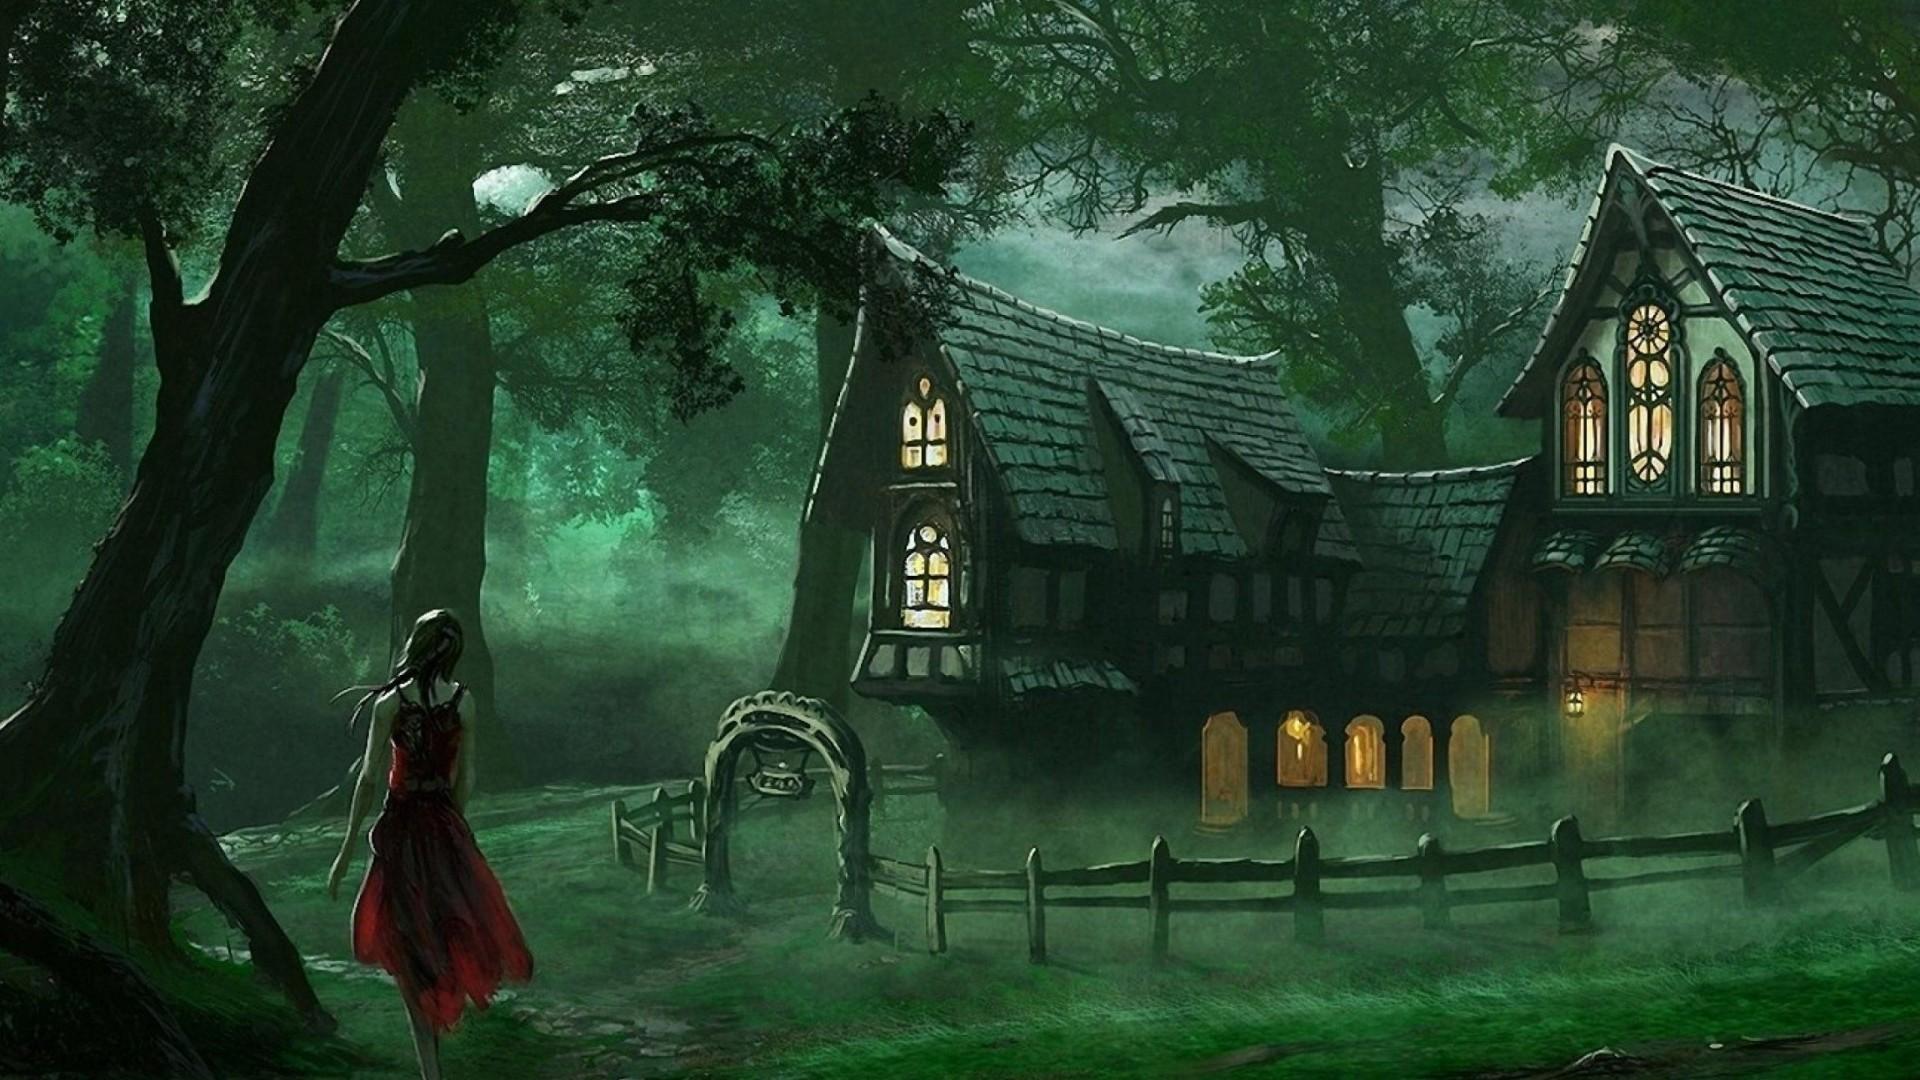 Spooky House Fantasy Forest wallpaper HD [1920 1080]